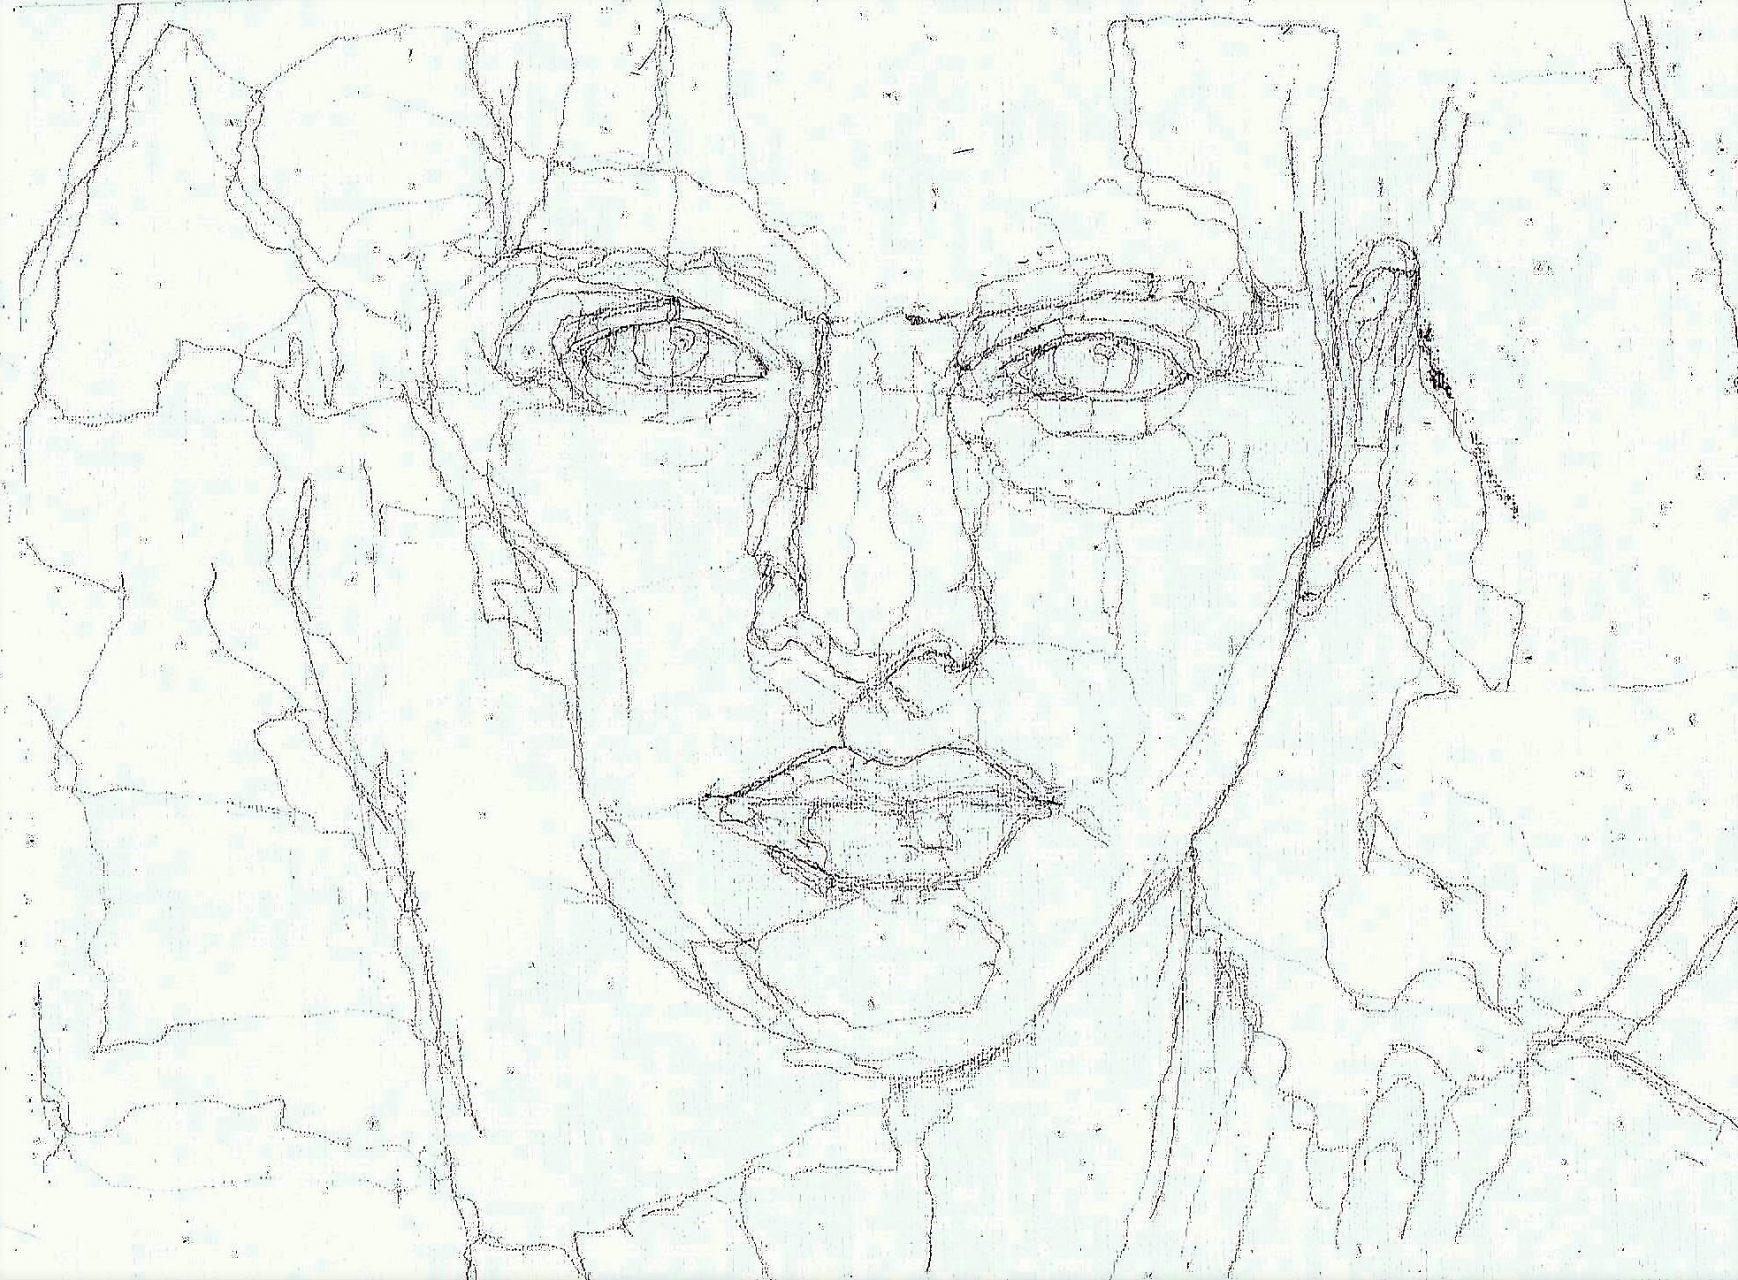 365 dagen een portret 73 Alie B, rapper Potlood 19c25